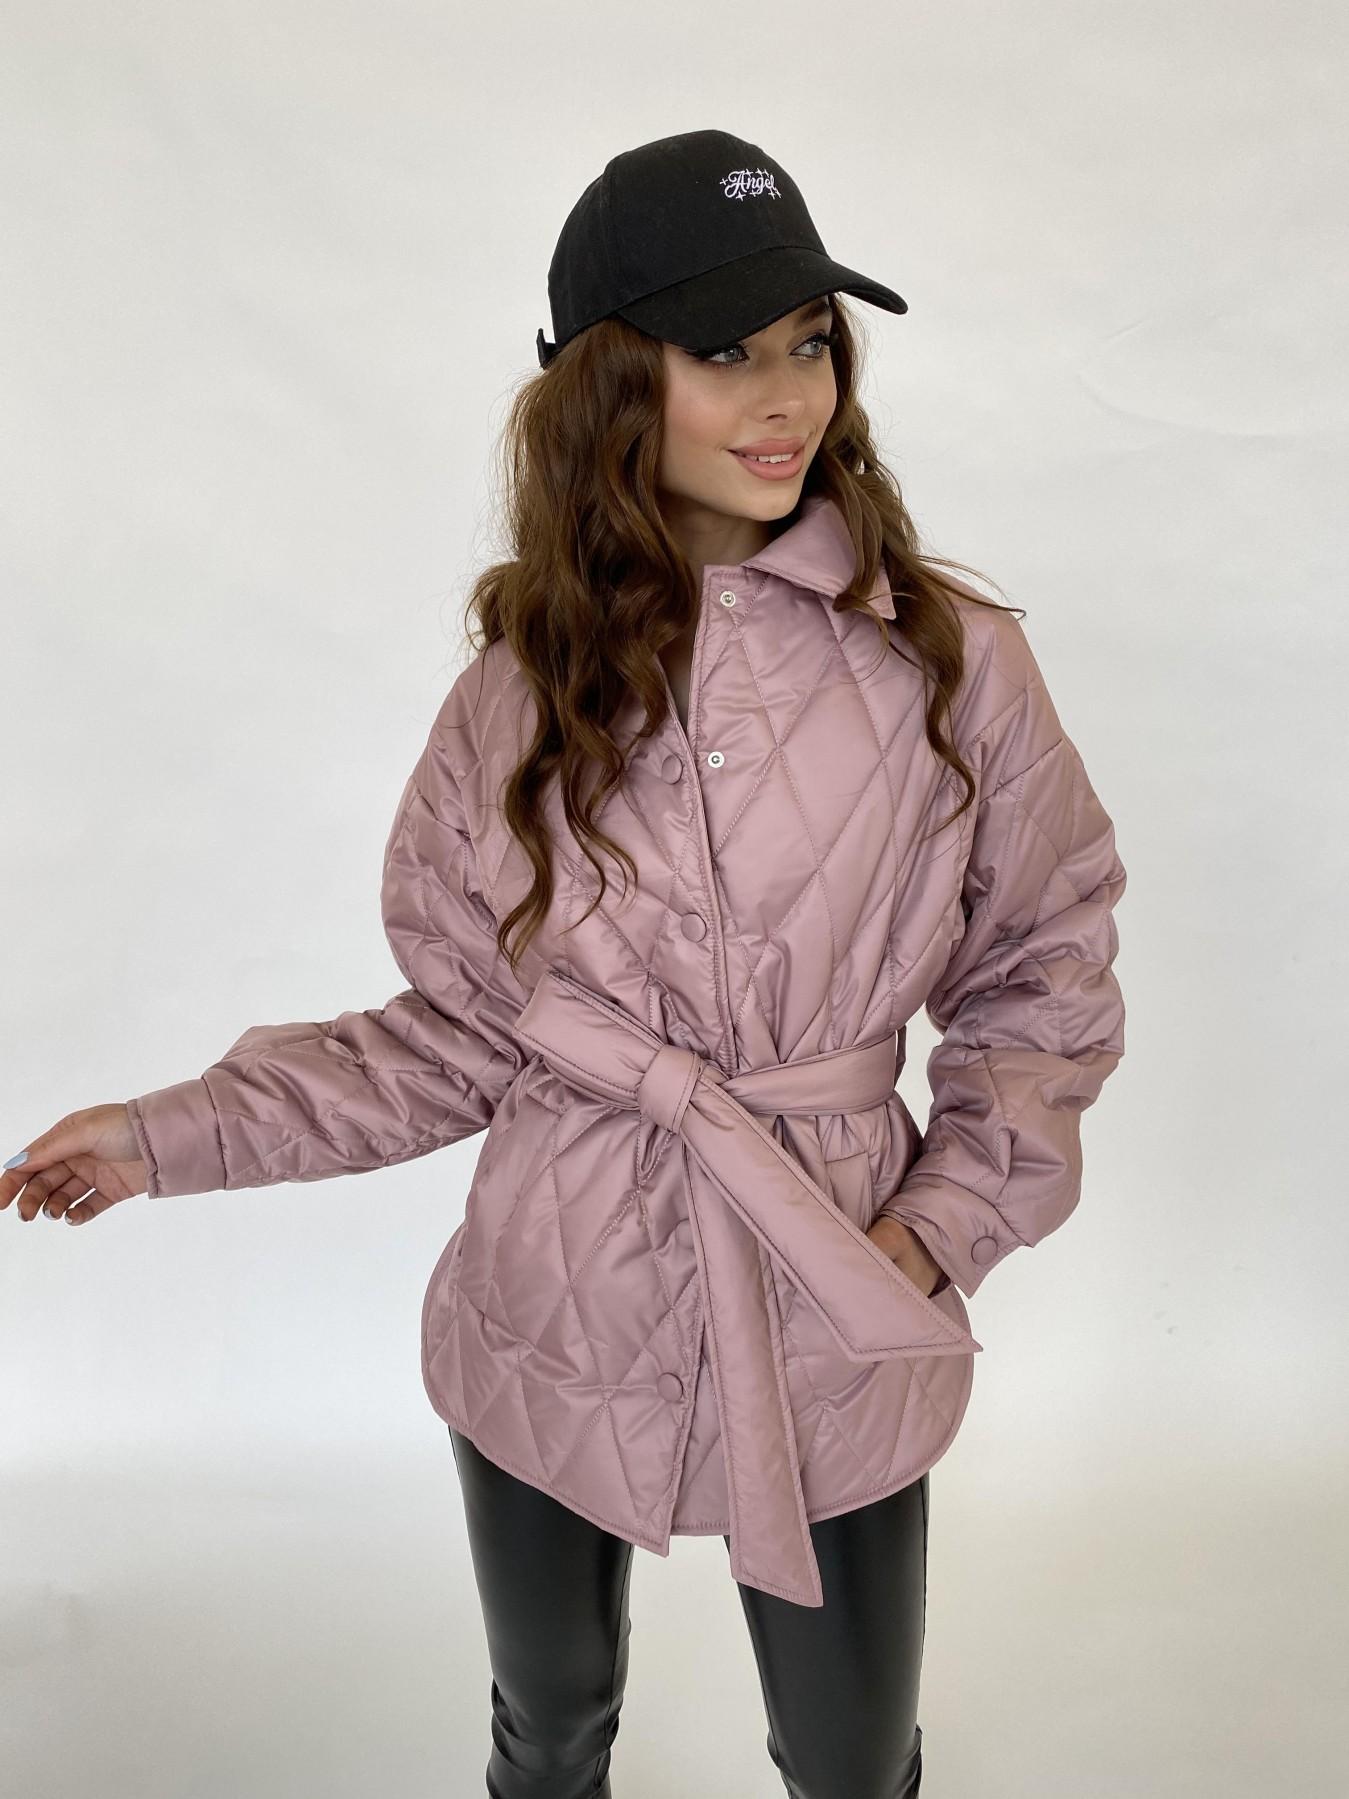 Моно  куртка из плащевой ткани Gloria 11081 АРТ. 47647 Цвет: Пудра - фото 2, интернет магазин tm-modus.ru